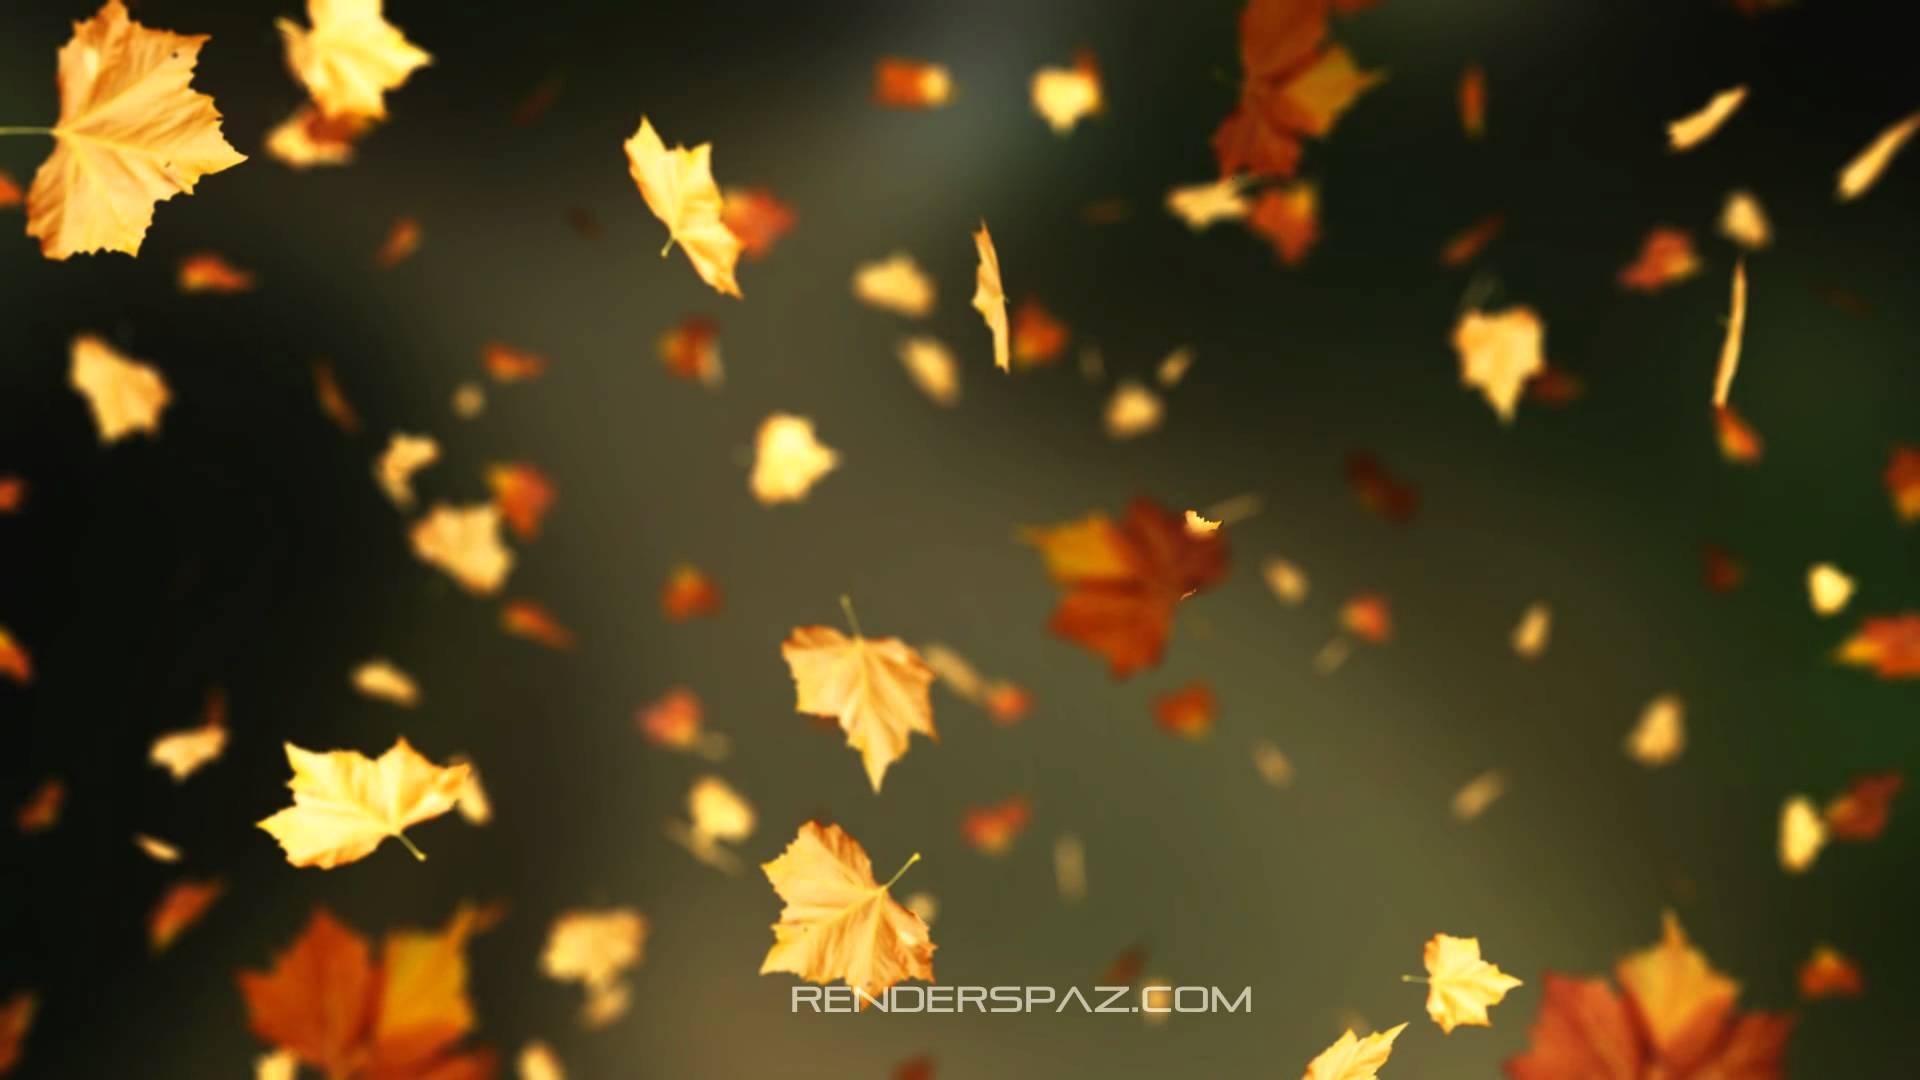 Fall Animated Wallpaper Windows 8 1920x1080